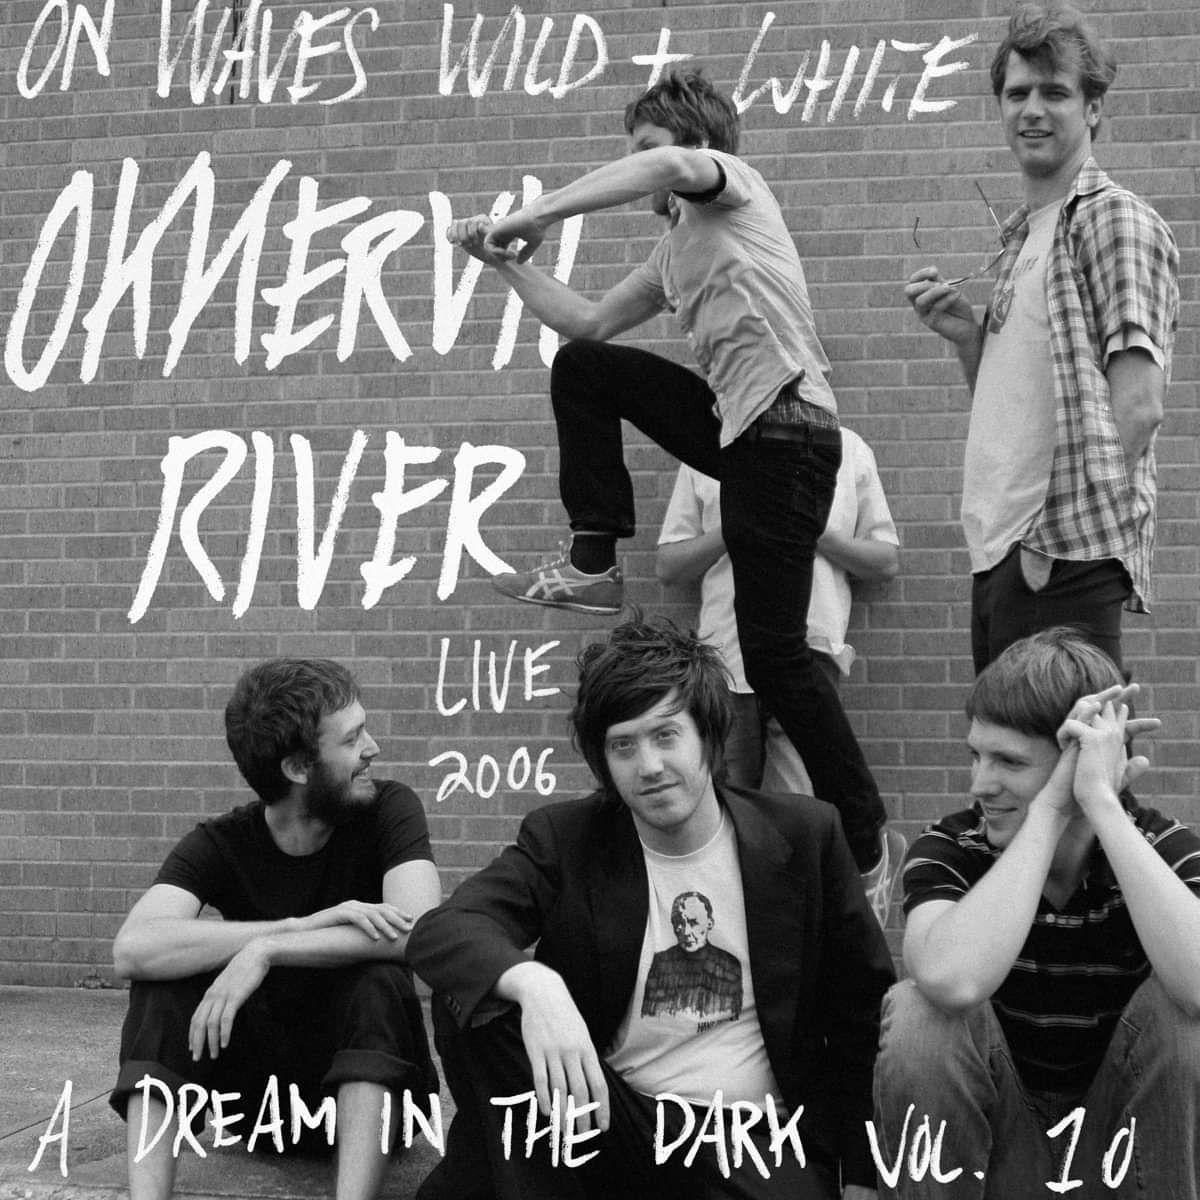 On Waves Wild + White (a la carte) - Okkervil River